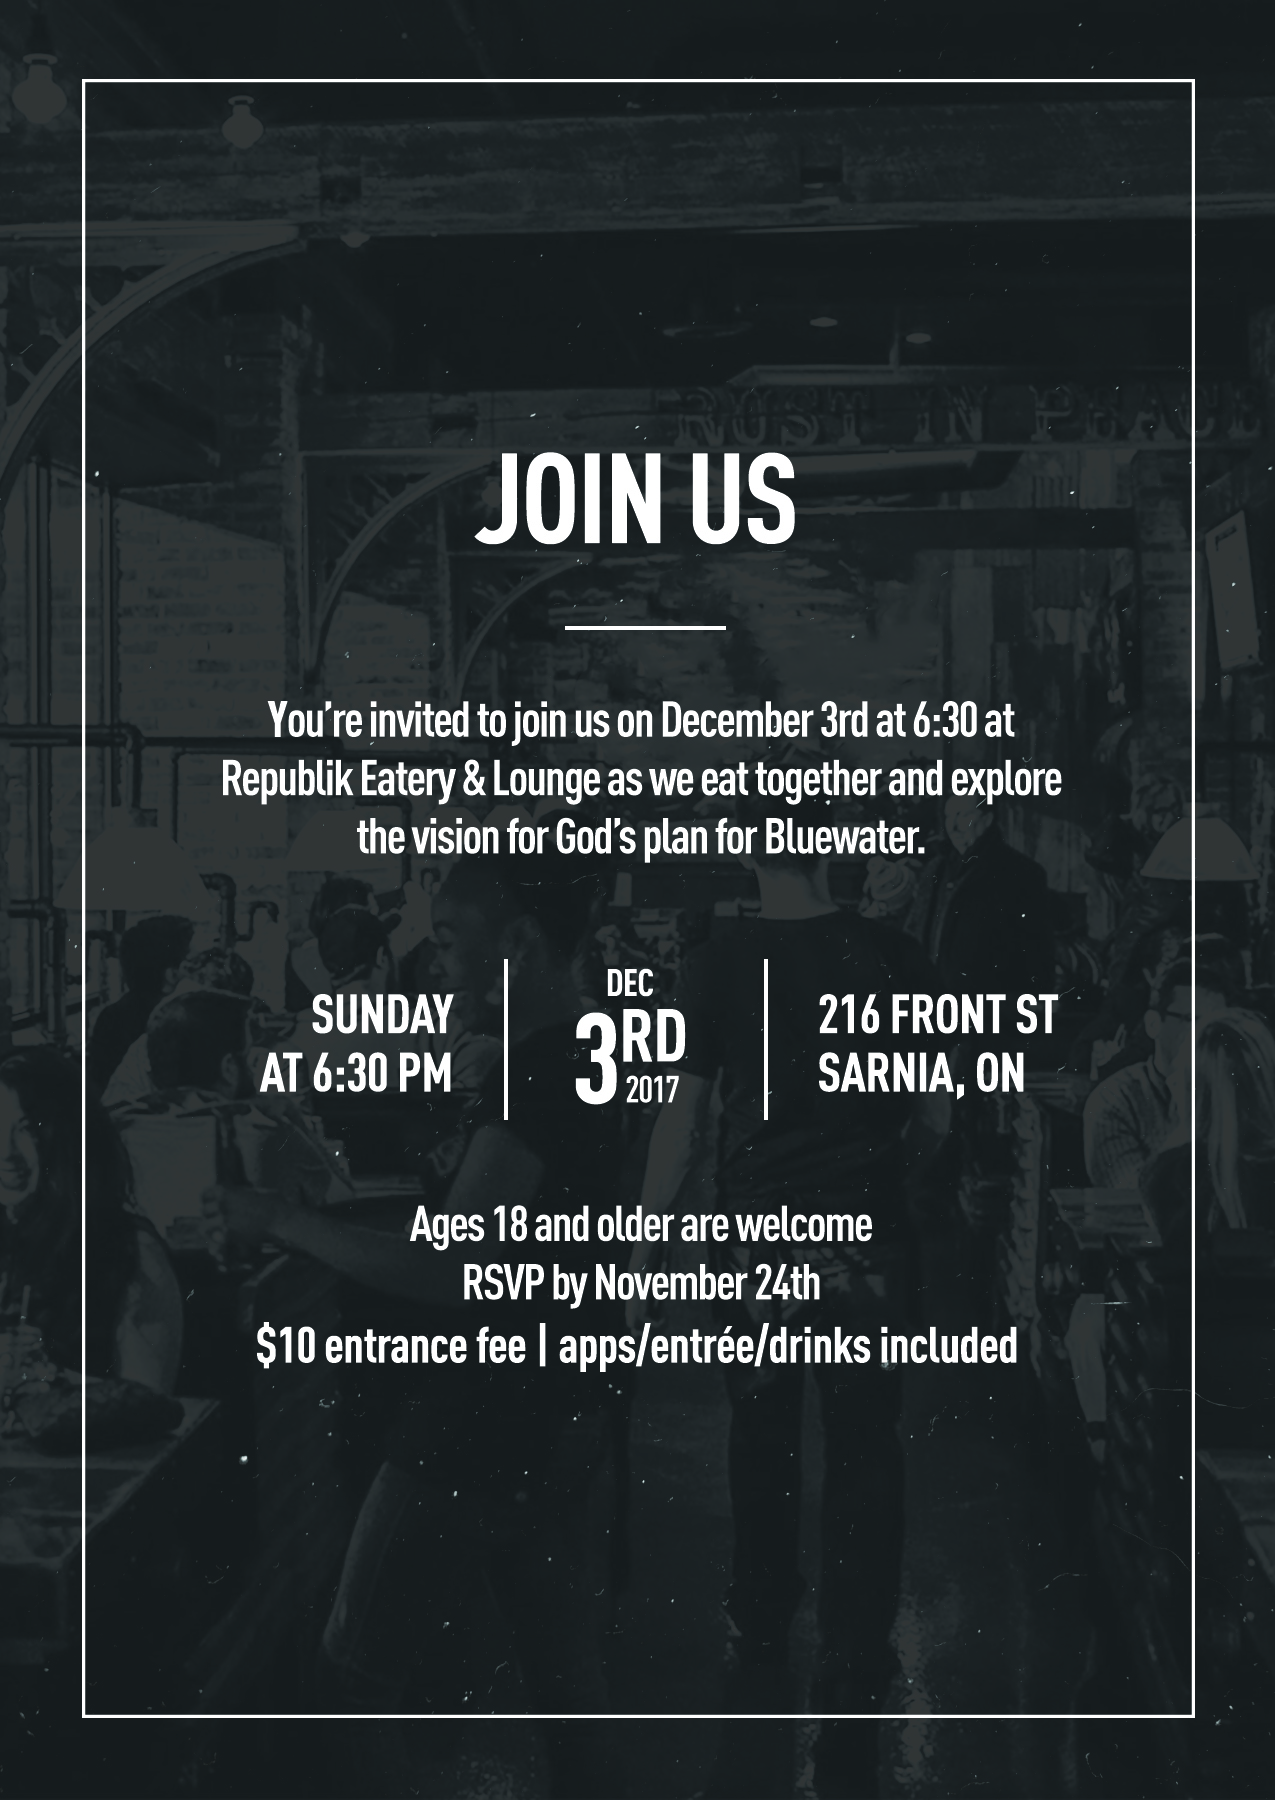 Bluewater event invite  overlay